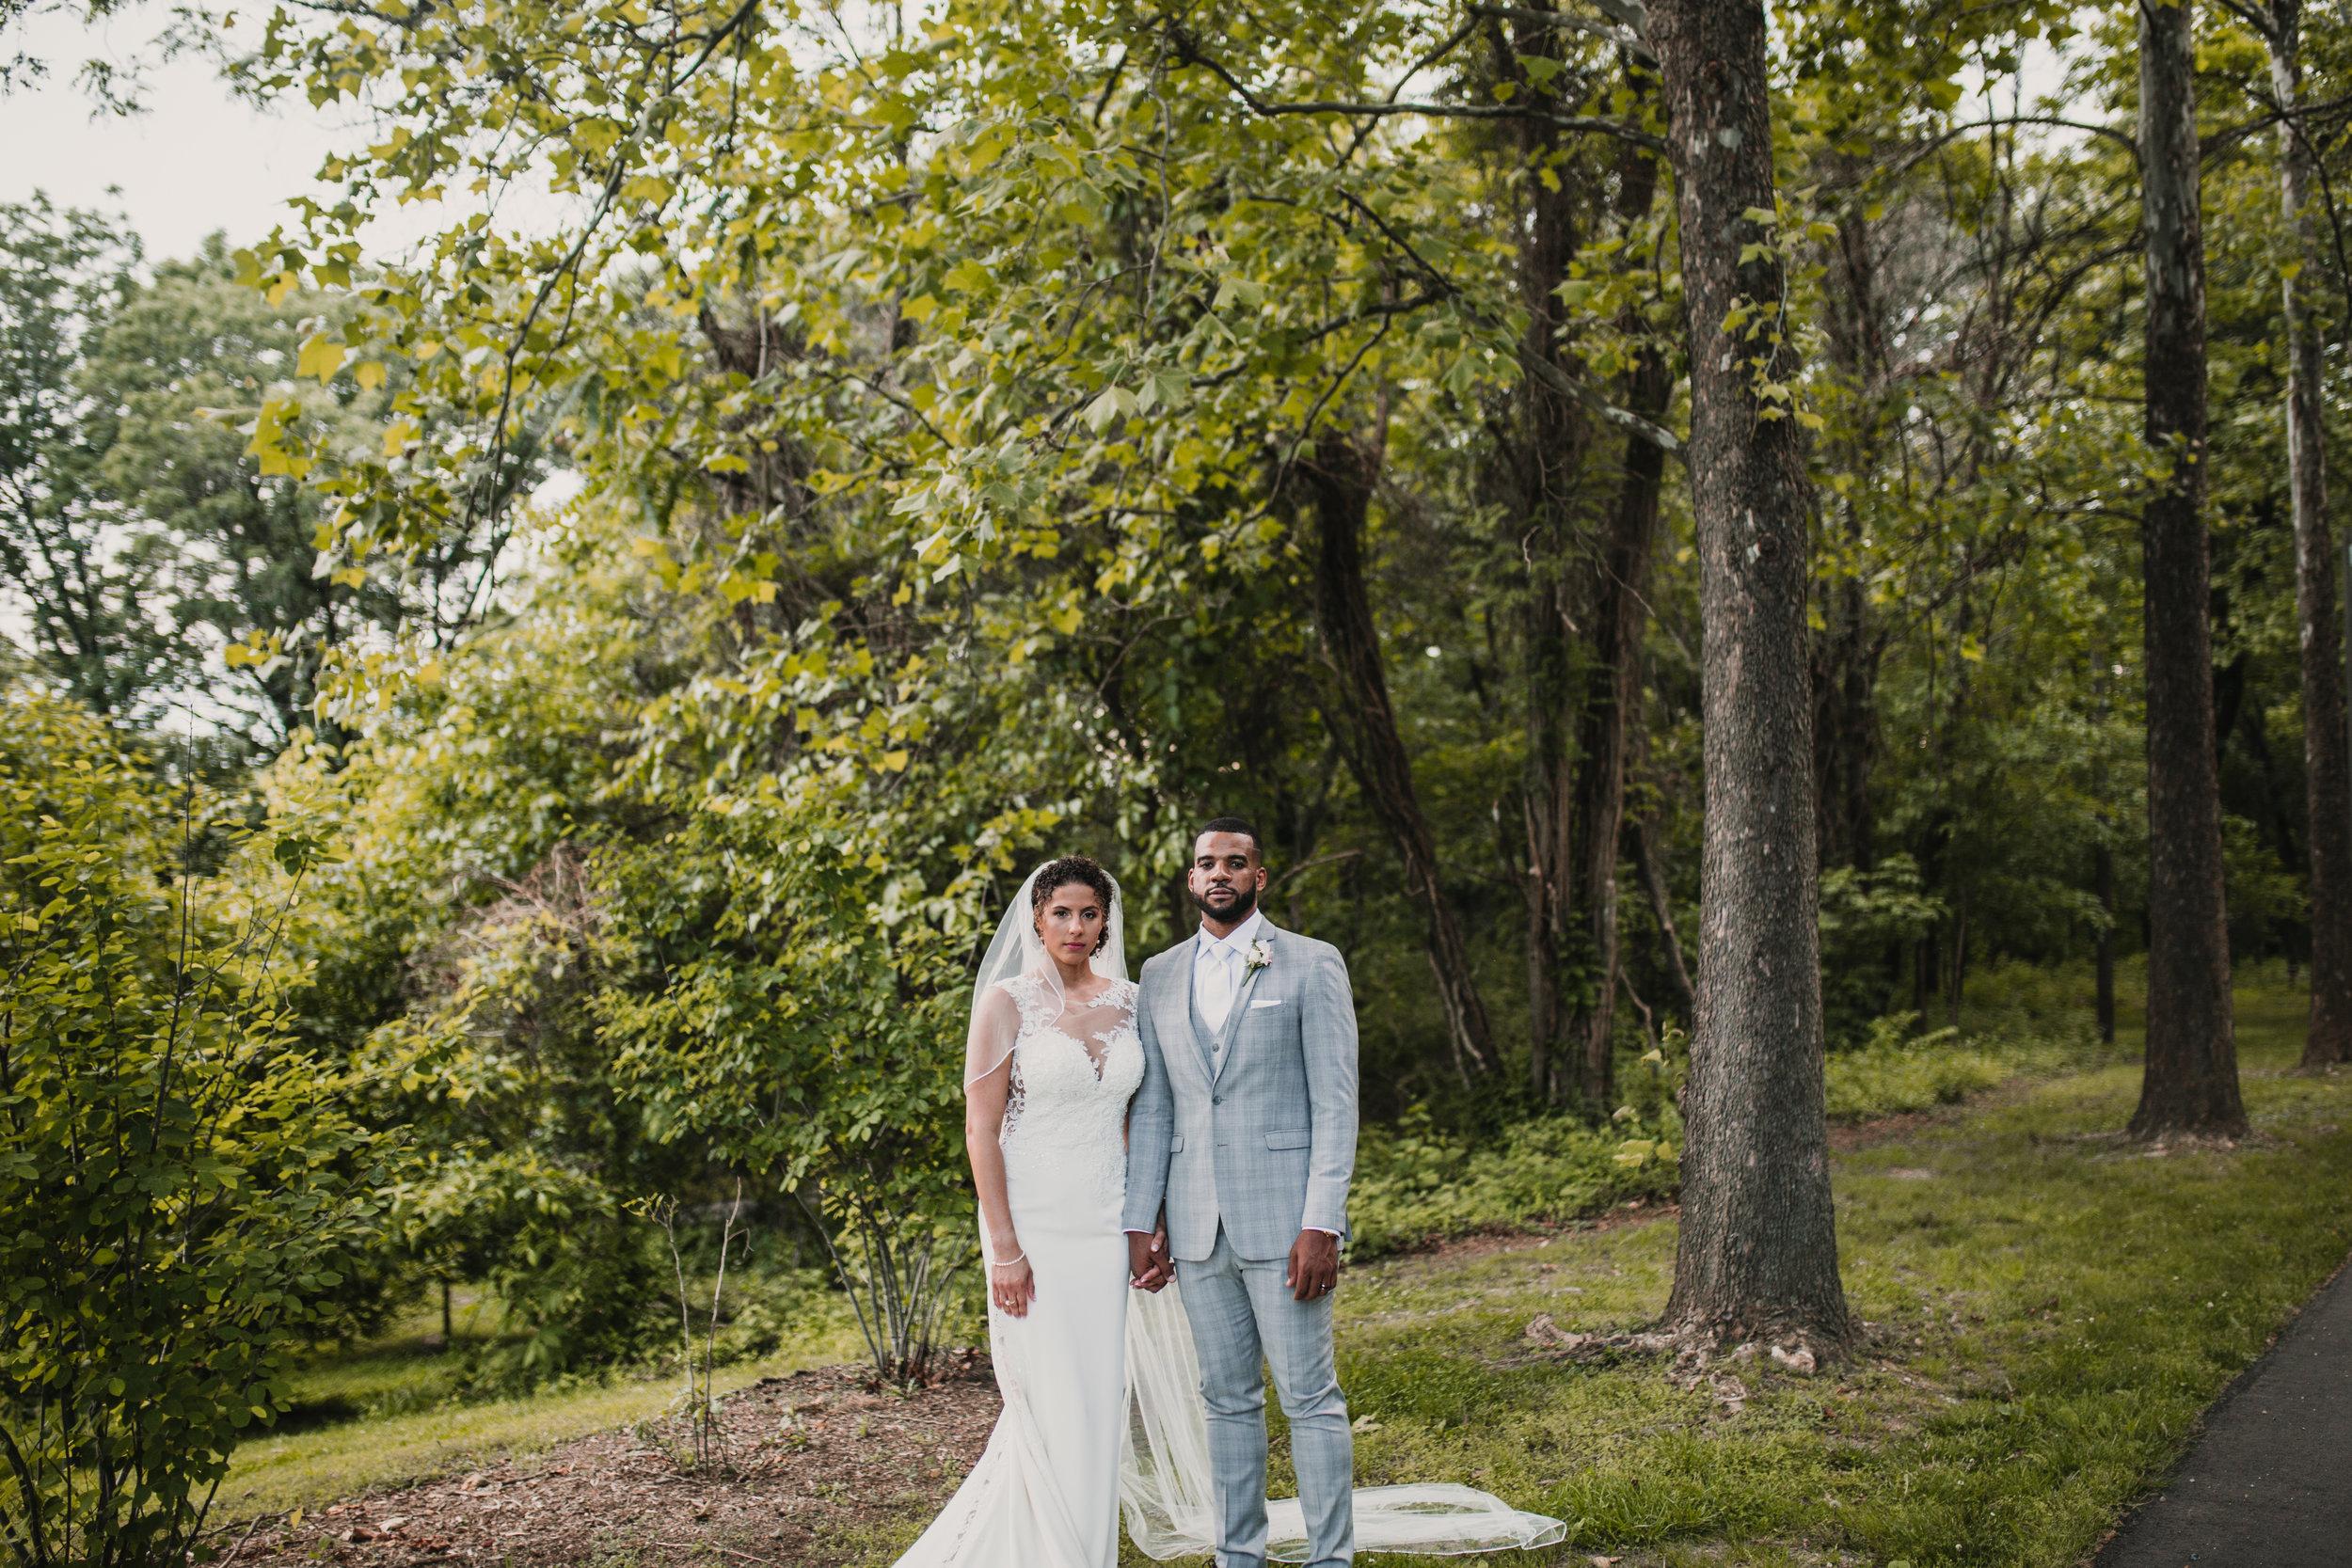 kendra_cameron_wedding(383of783).jpg